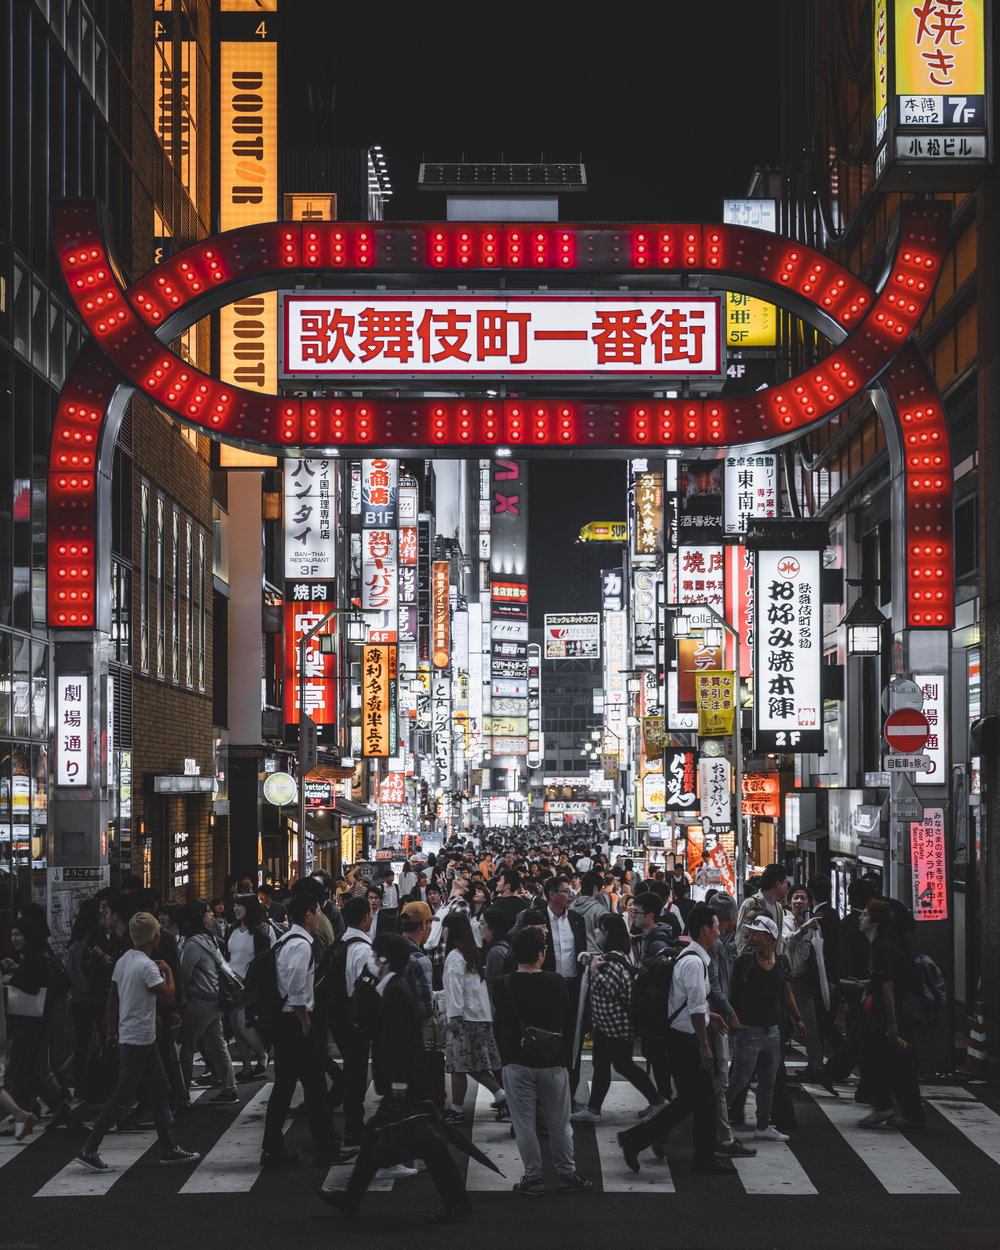 Tokyo's unique street atmosphere